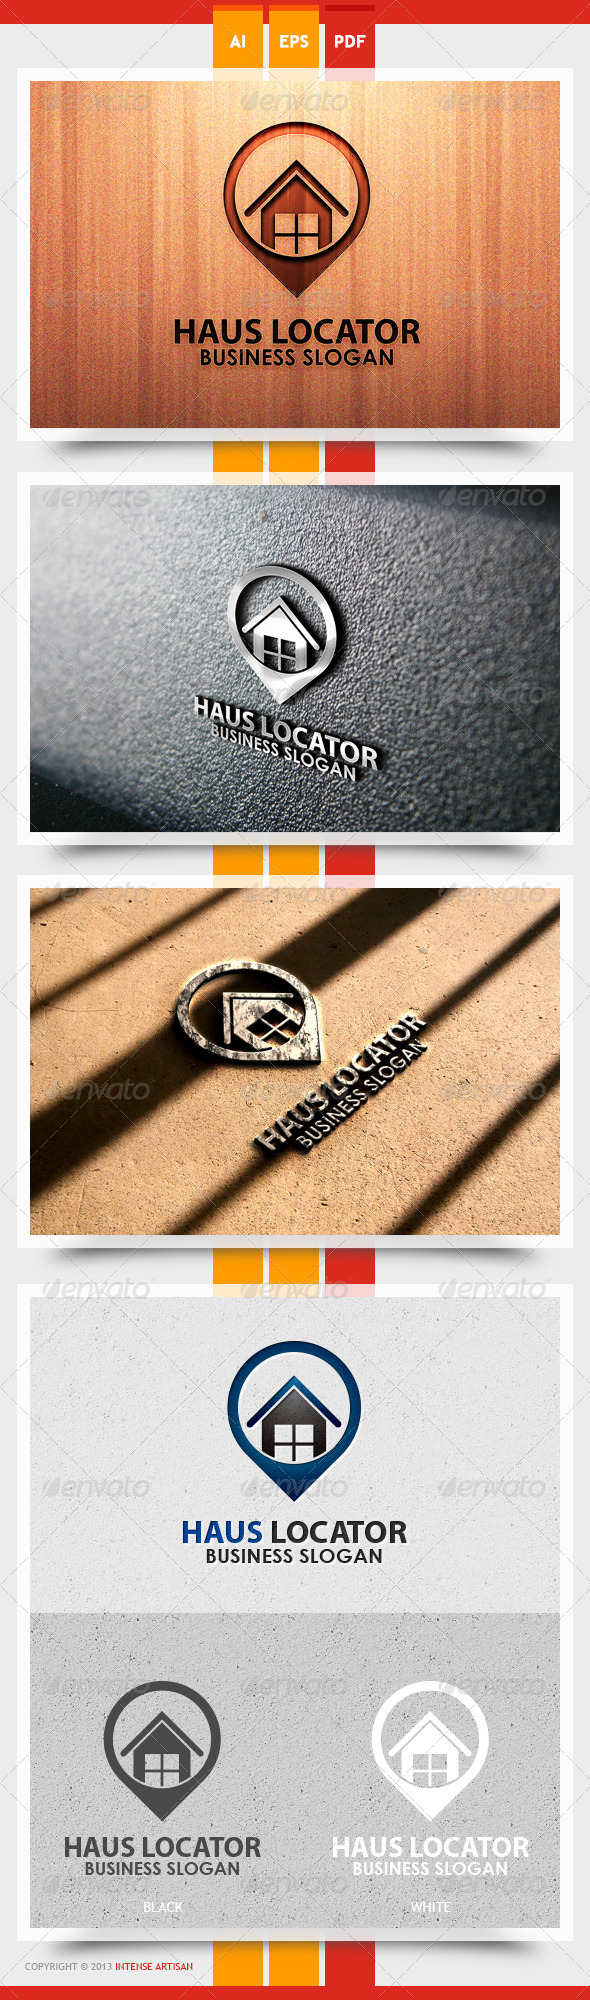 GraphicRiver Haus Locator Logo Template 5565611